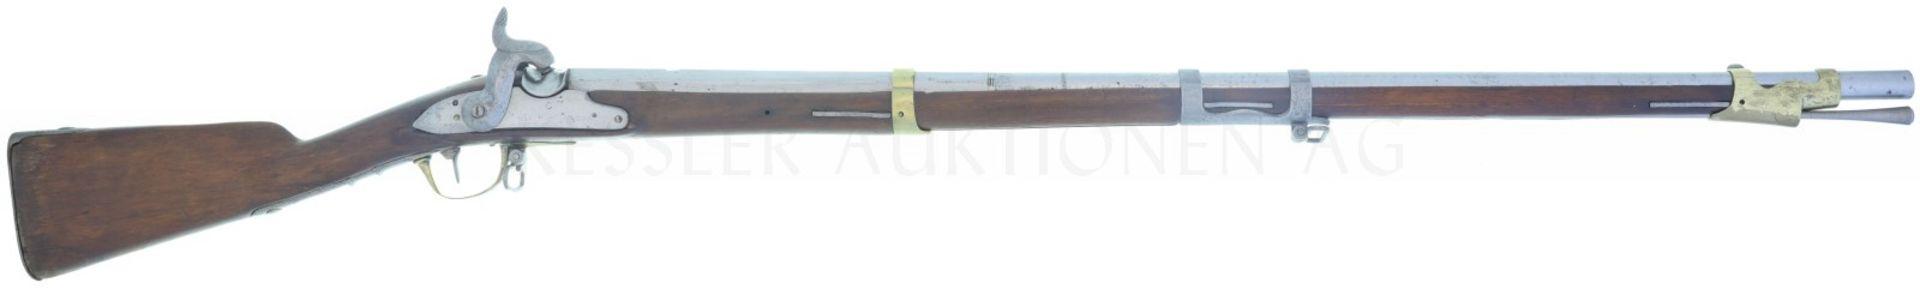 Perkussionsgewehr, Infanterie 1804/42, (franz. 1777), Kant. Bern, Kal. 17.6mm